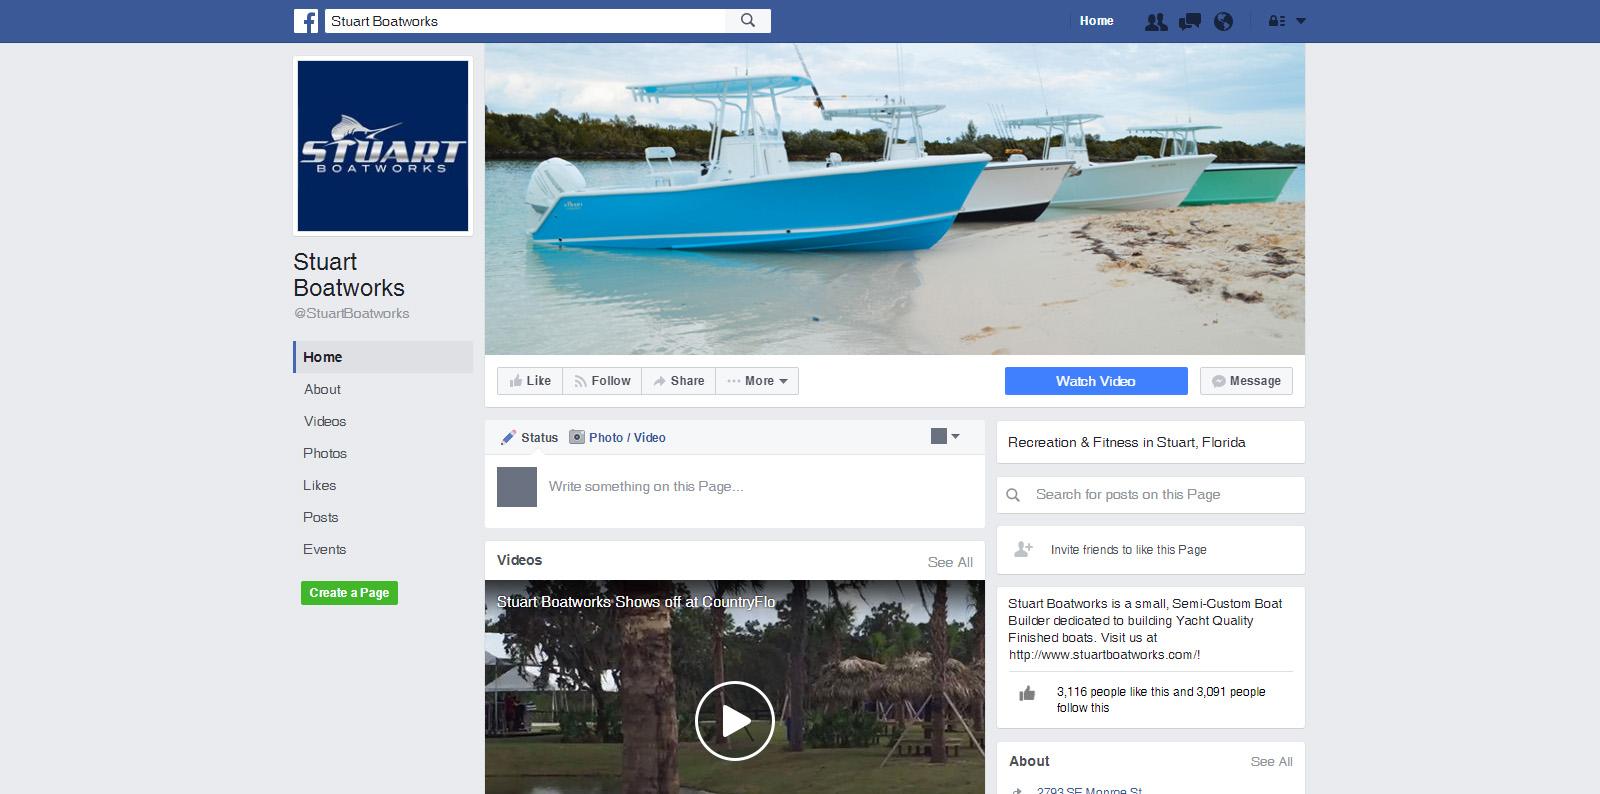 Stuart Boatworks - Social Media Marketing